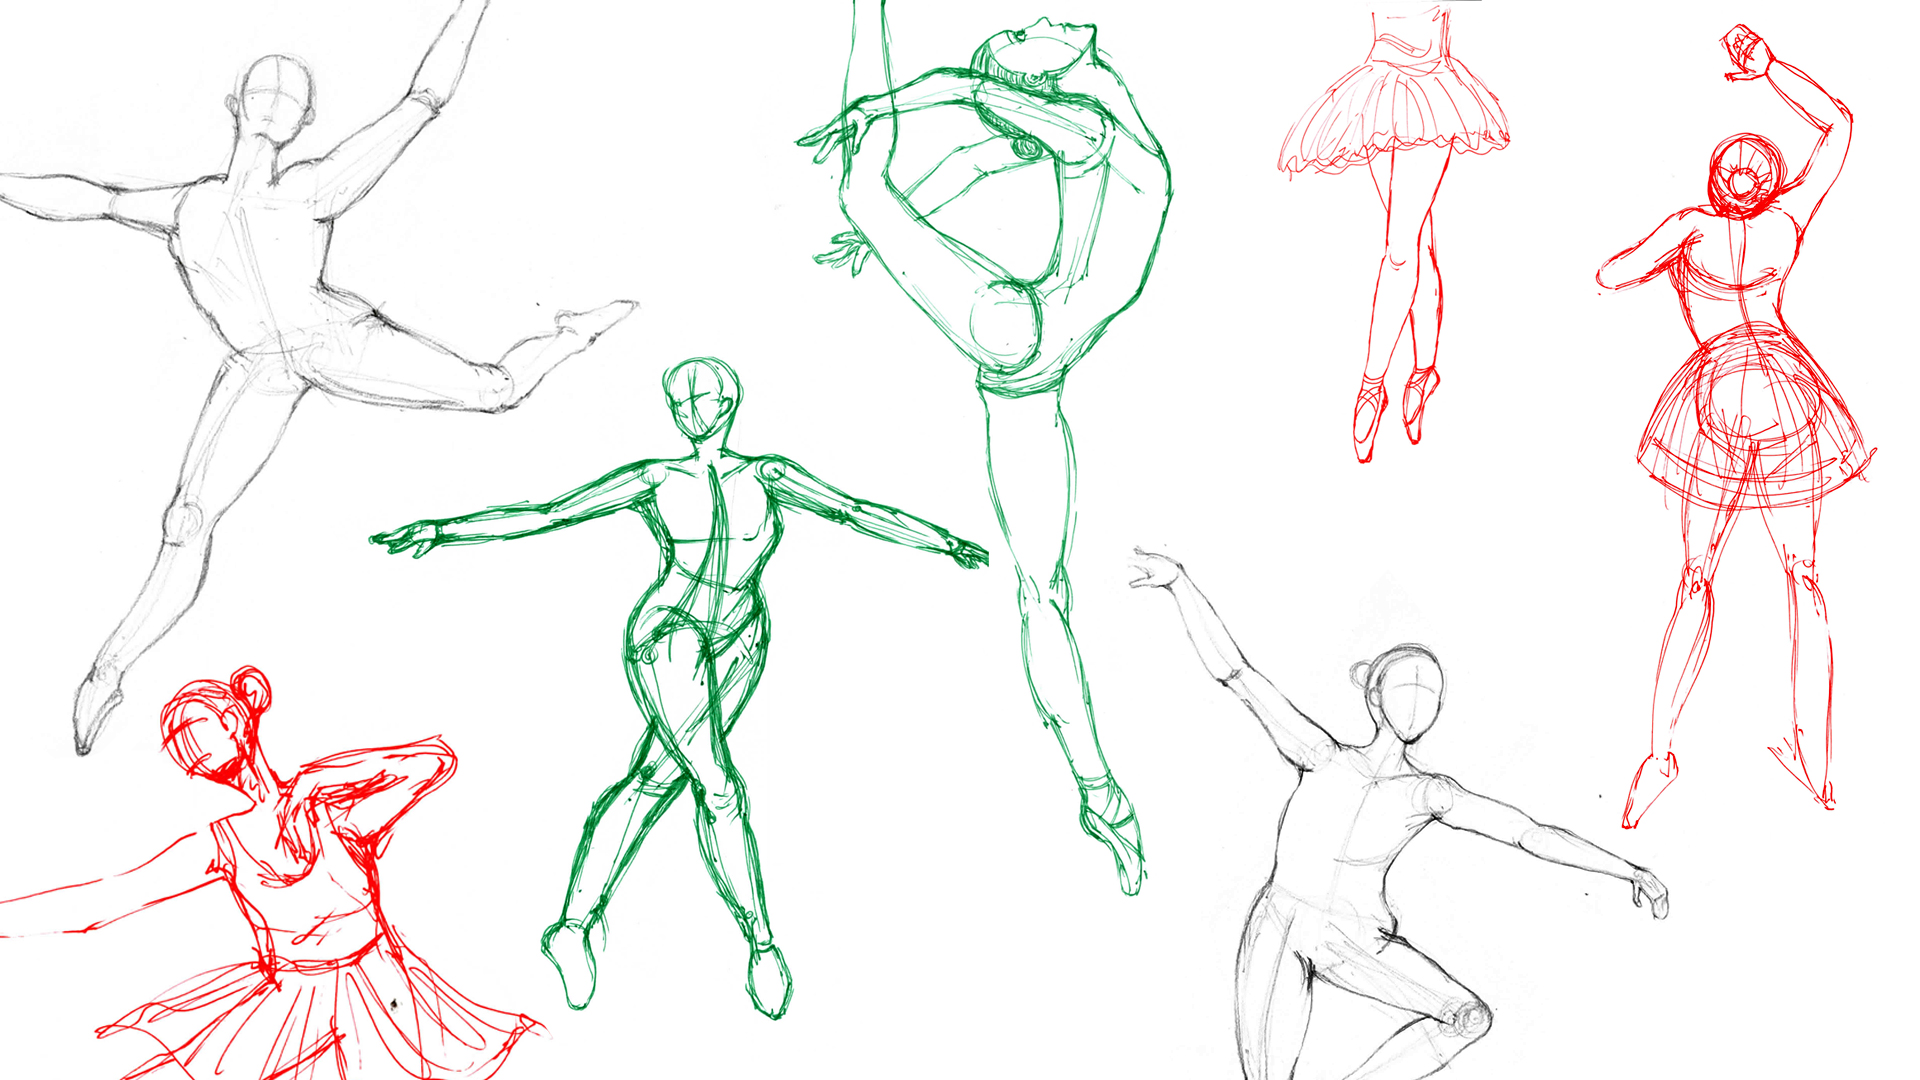 drawing03.jpg